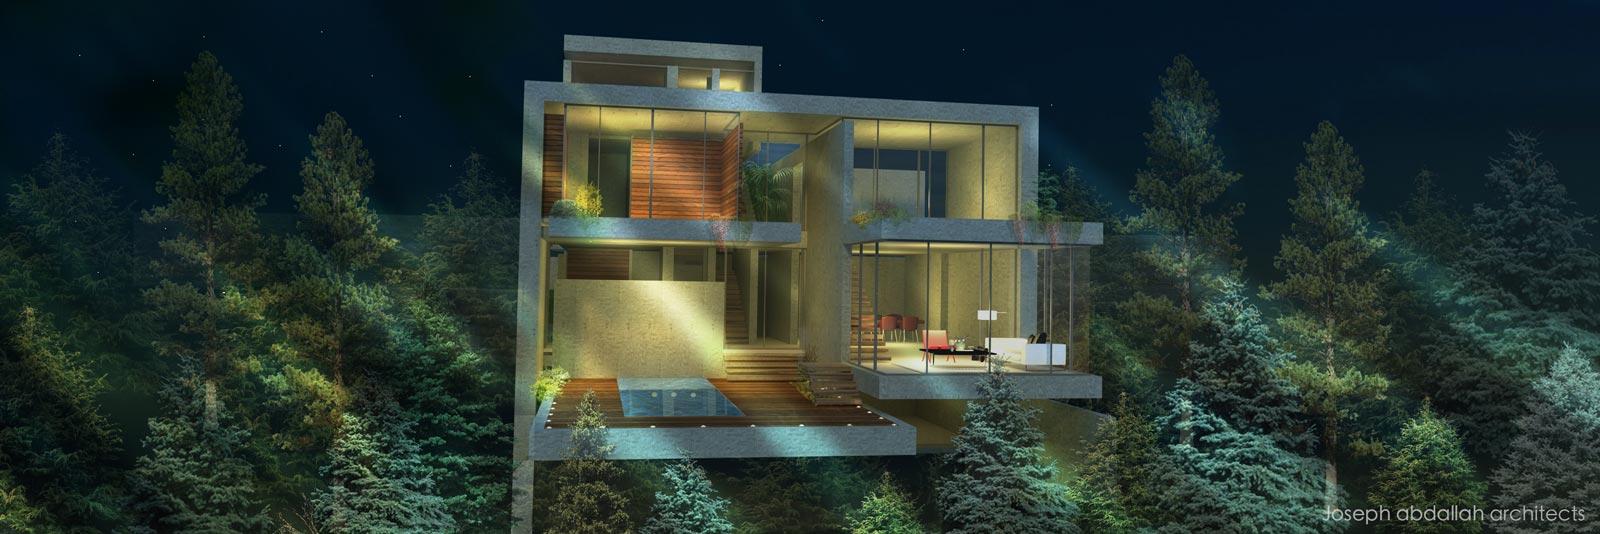 n-chalet-water-mirror-villa-fakra-lebanon-joseph-abdallah-architects-2